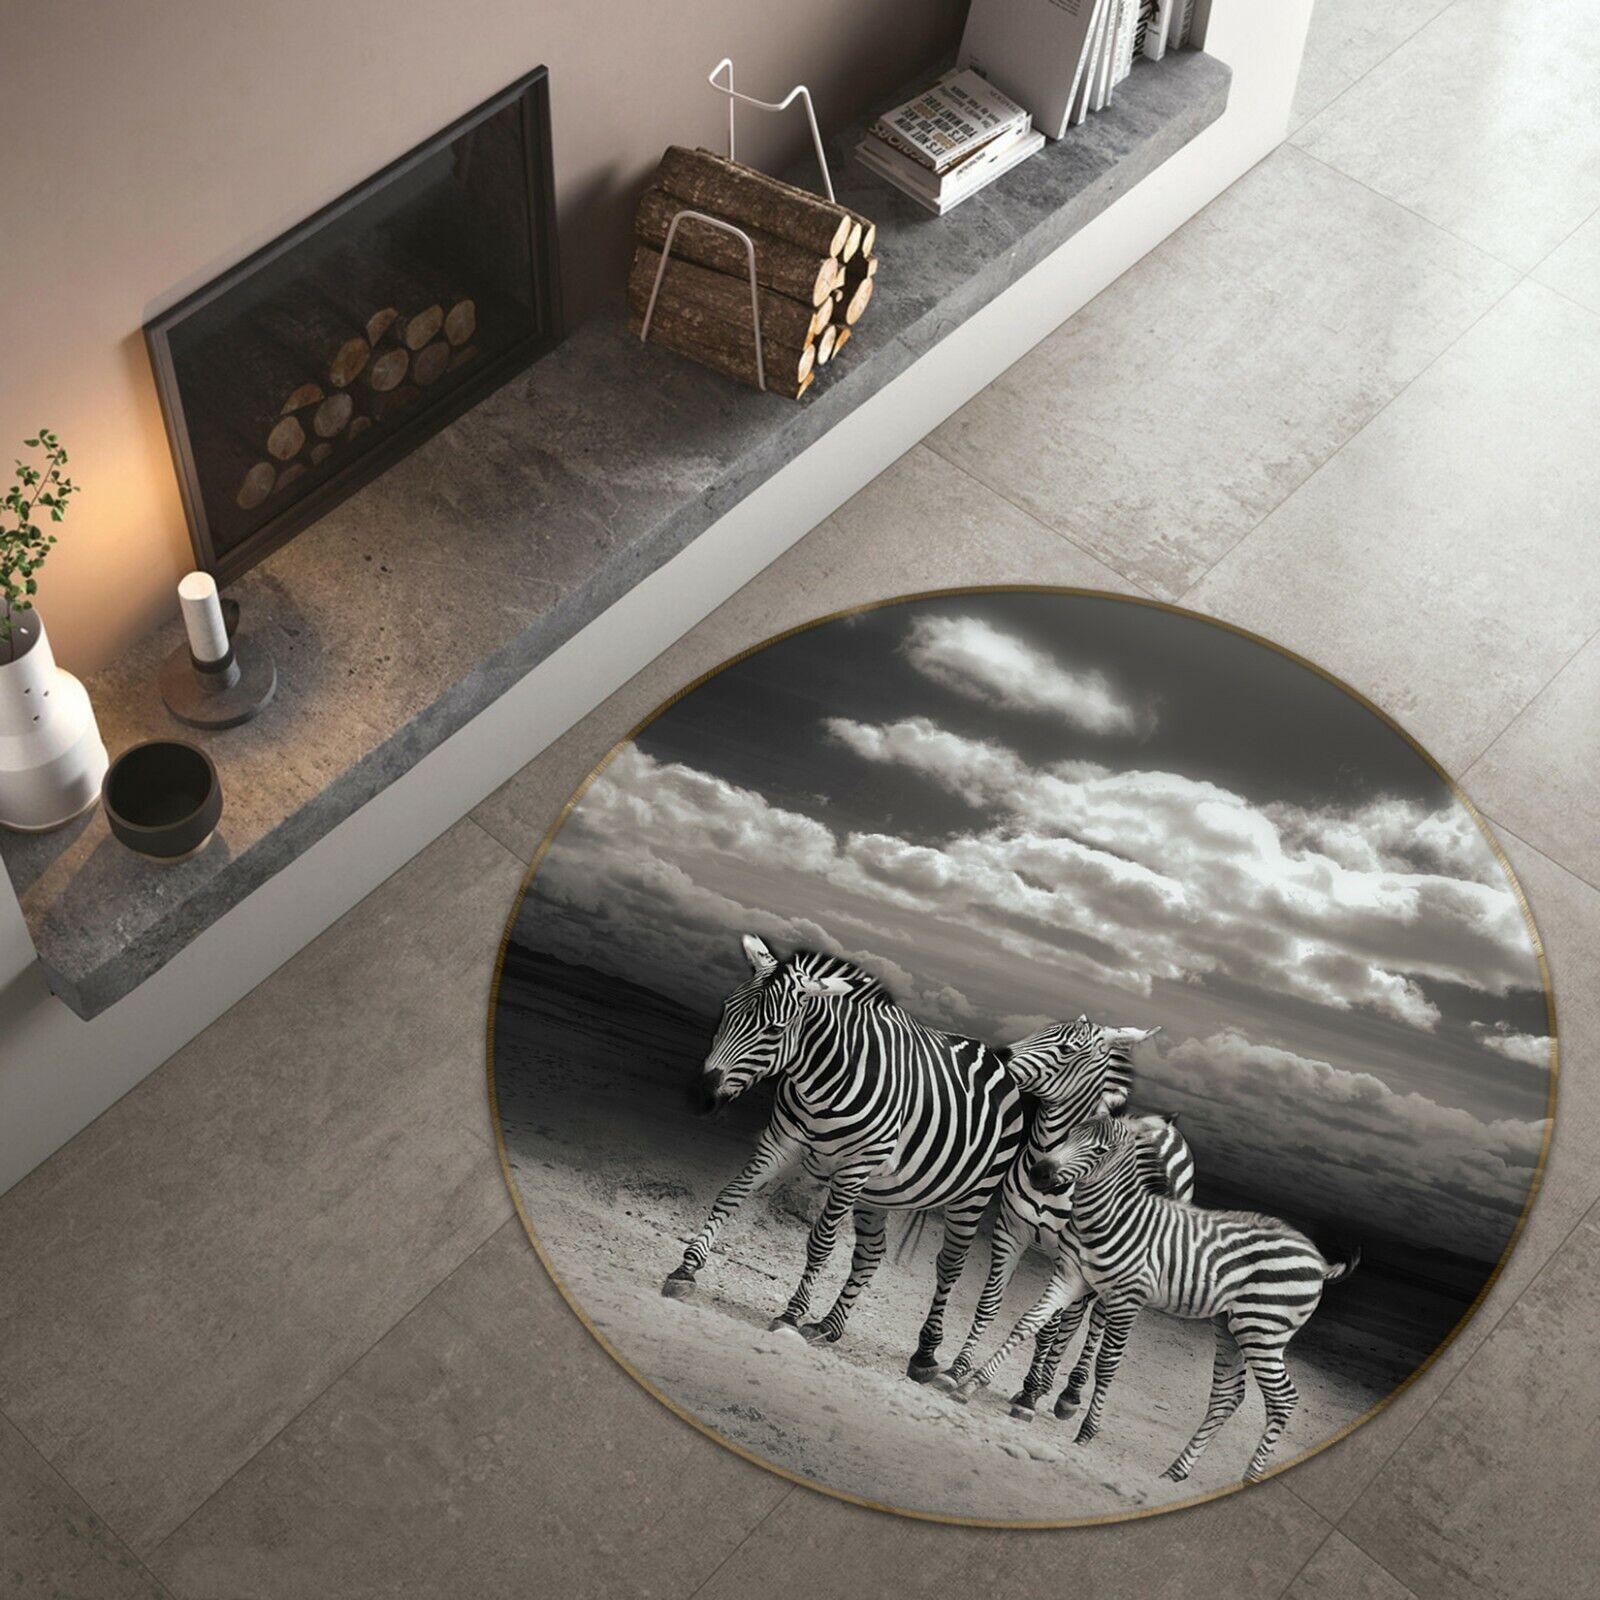 3D C97 CIELO Zebra Animale tappetino antiscivolo tappeto rossoondo elegante Tappeto Wendy